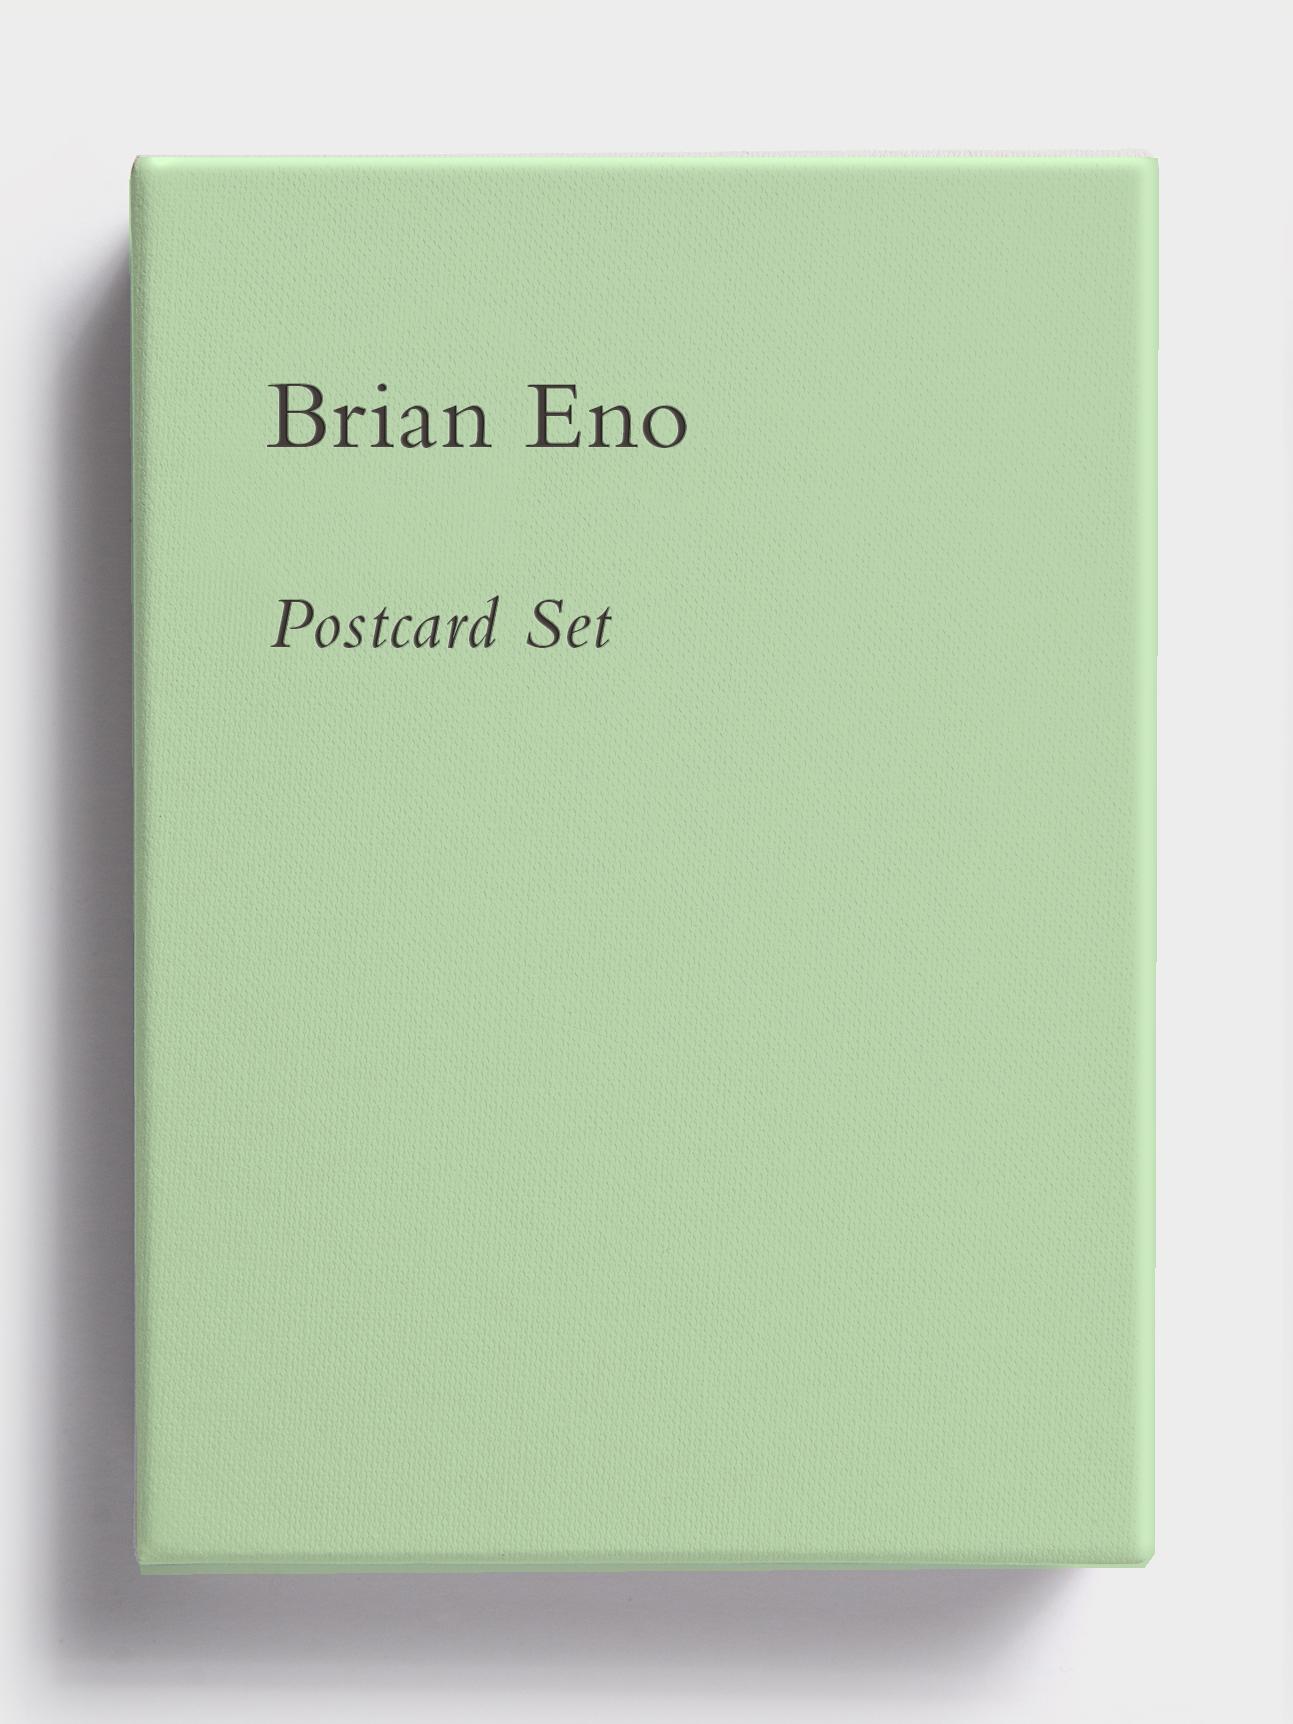 Postcard Set (Park Green) by Brian Eno